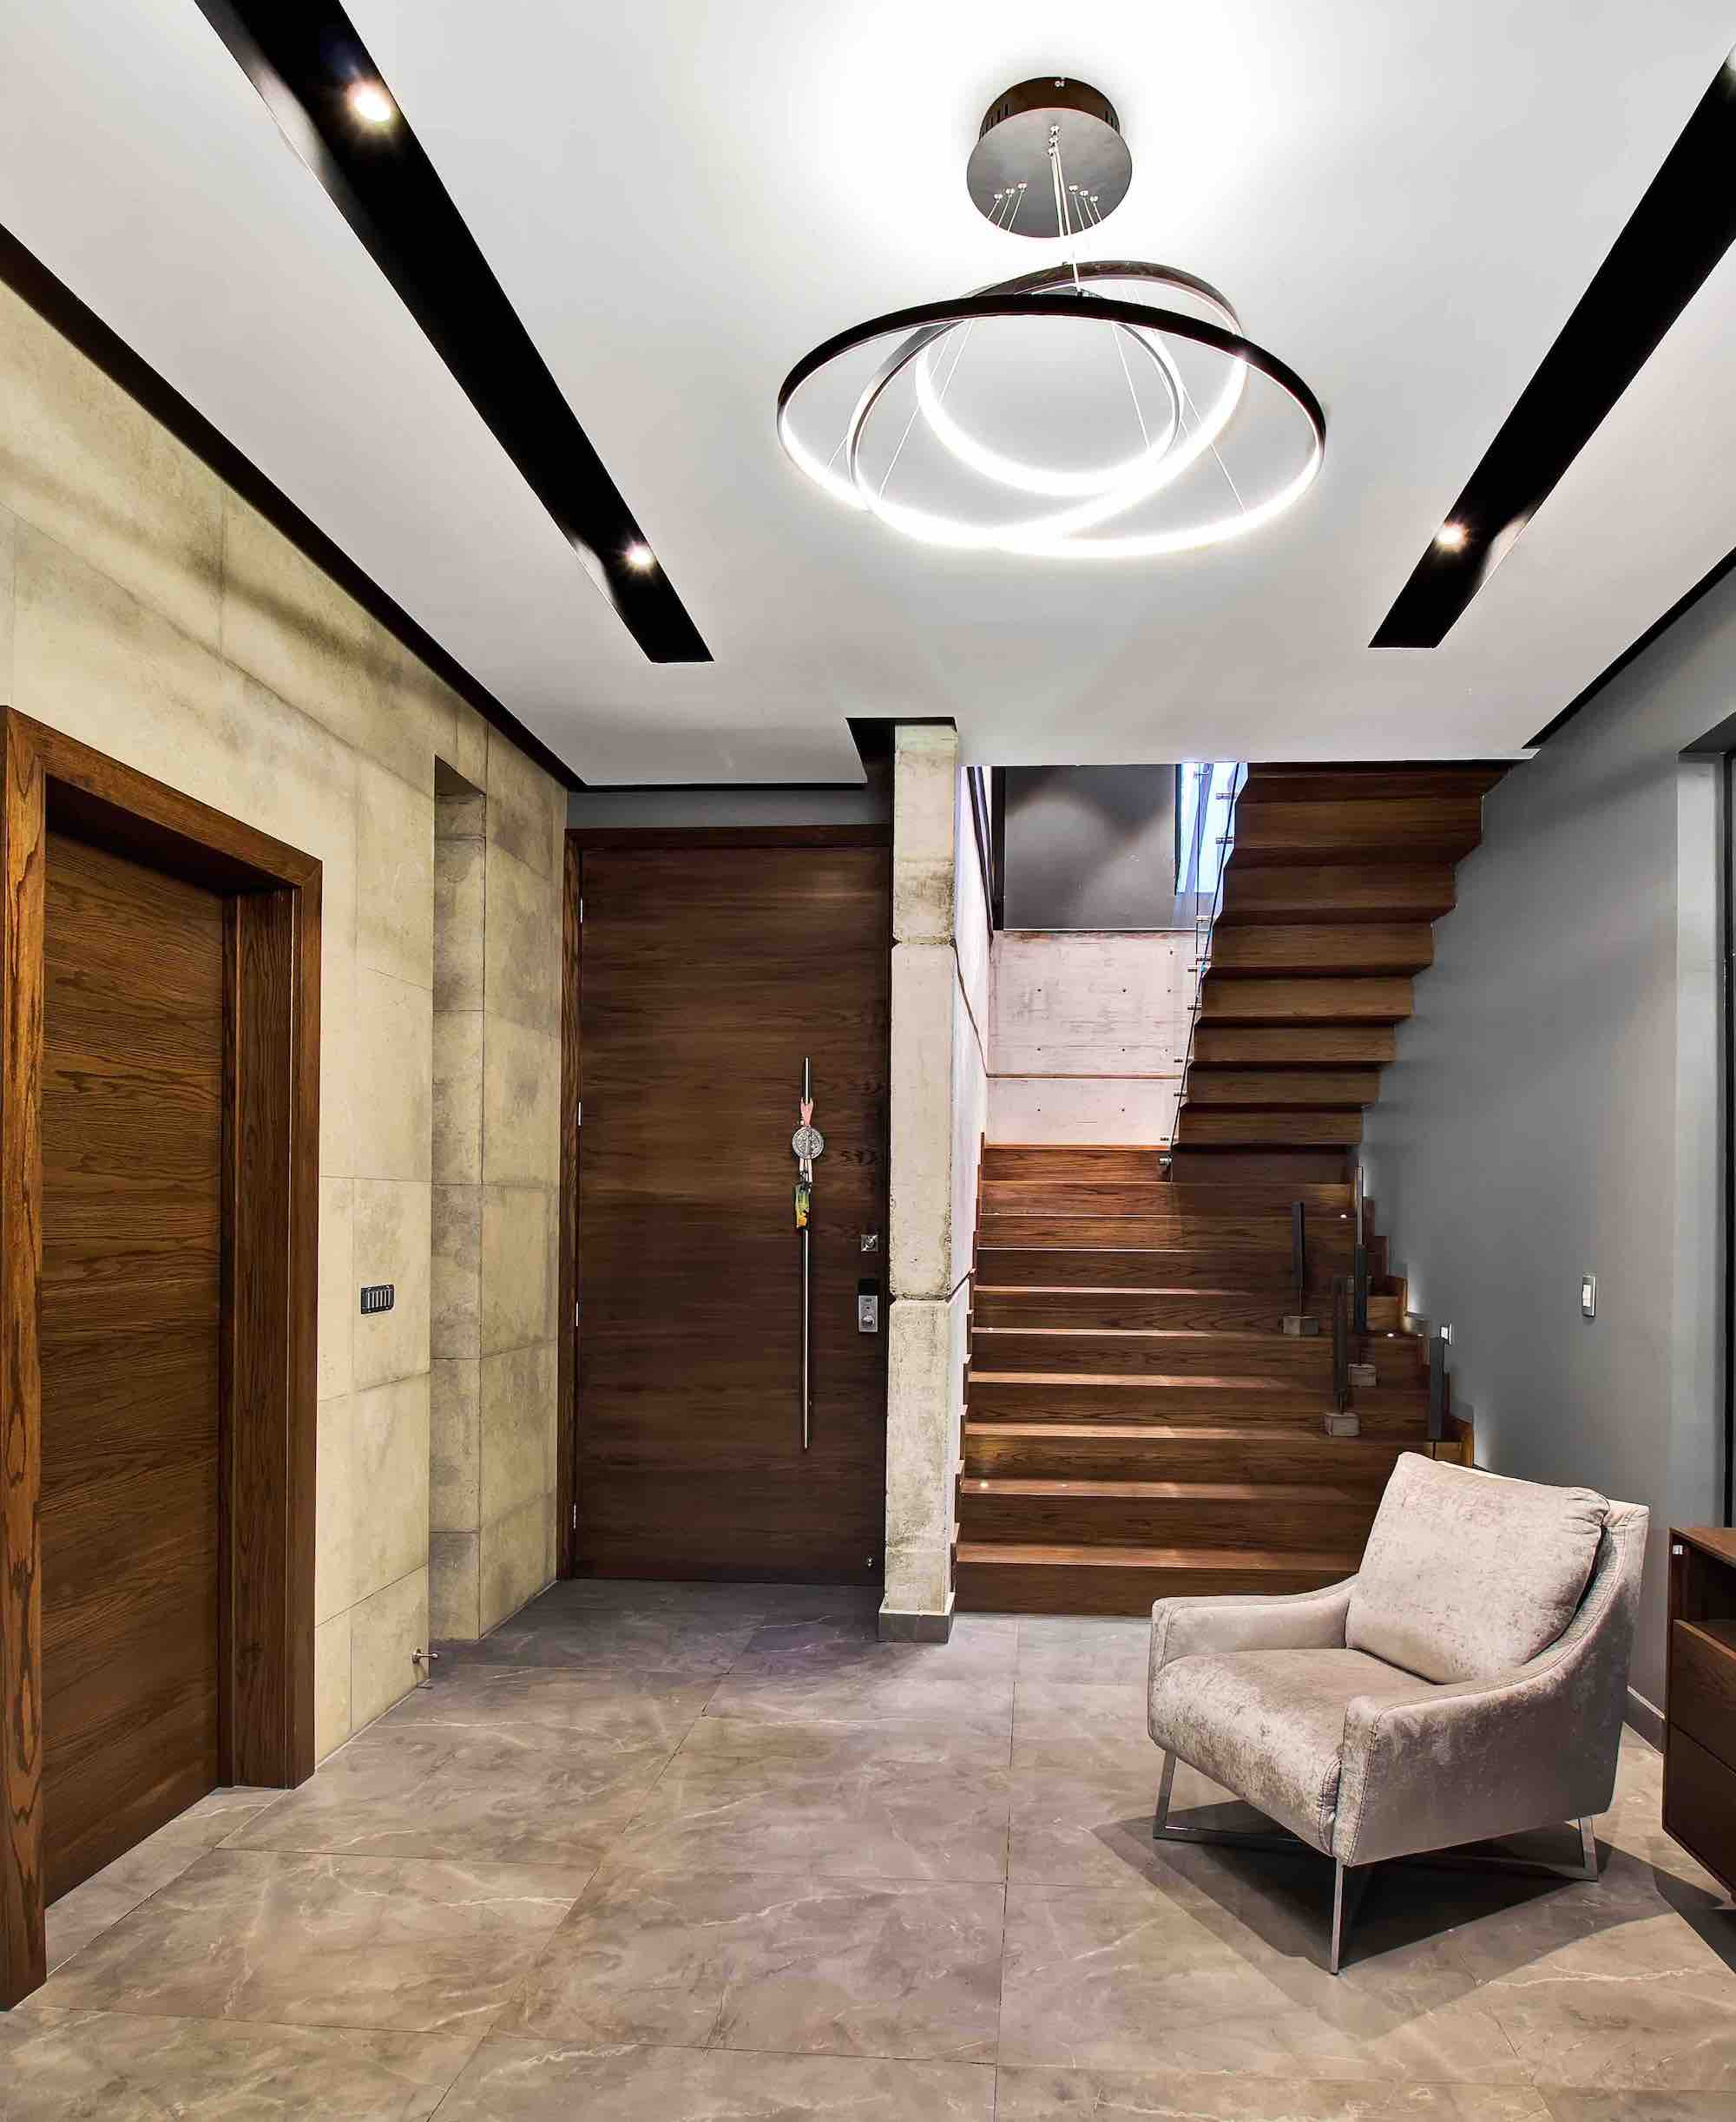 GR_House_Gallardo_arquitectura_amazingarchitecture_mexico_007.jpg